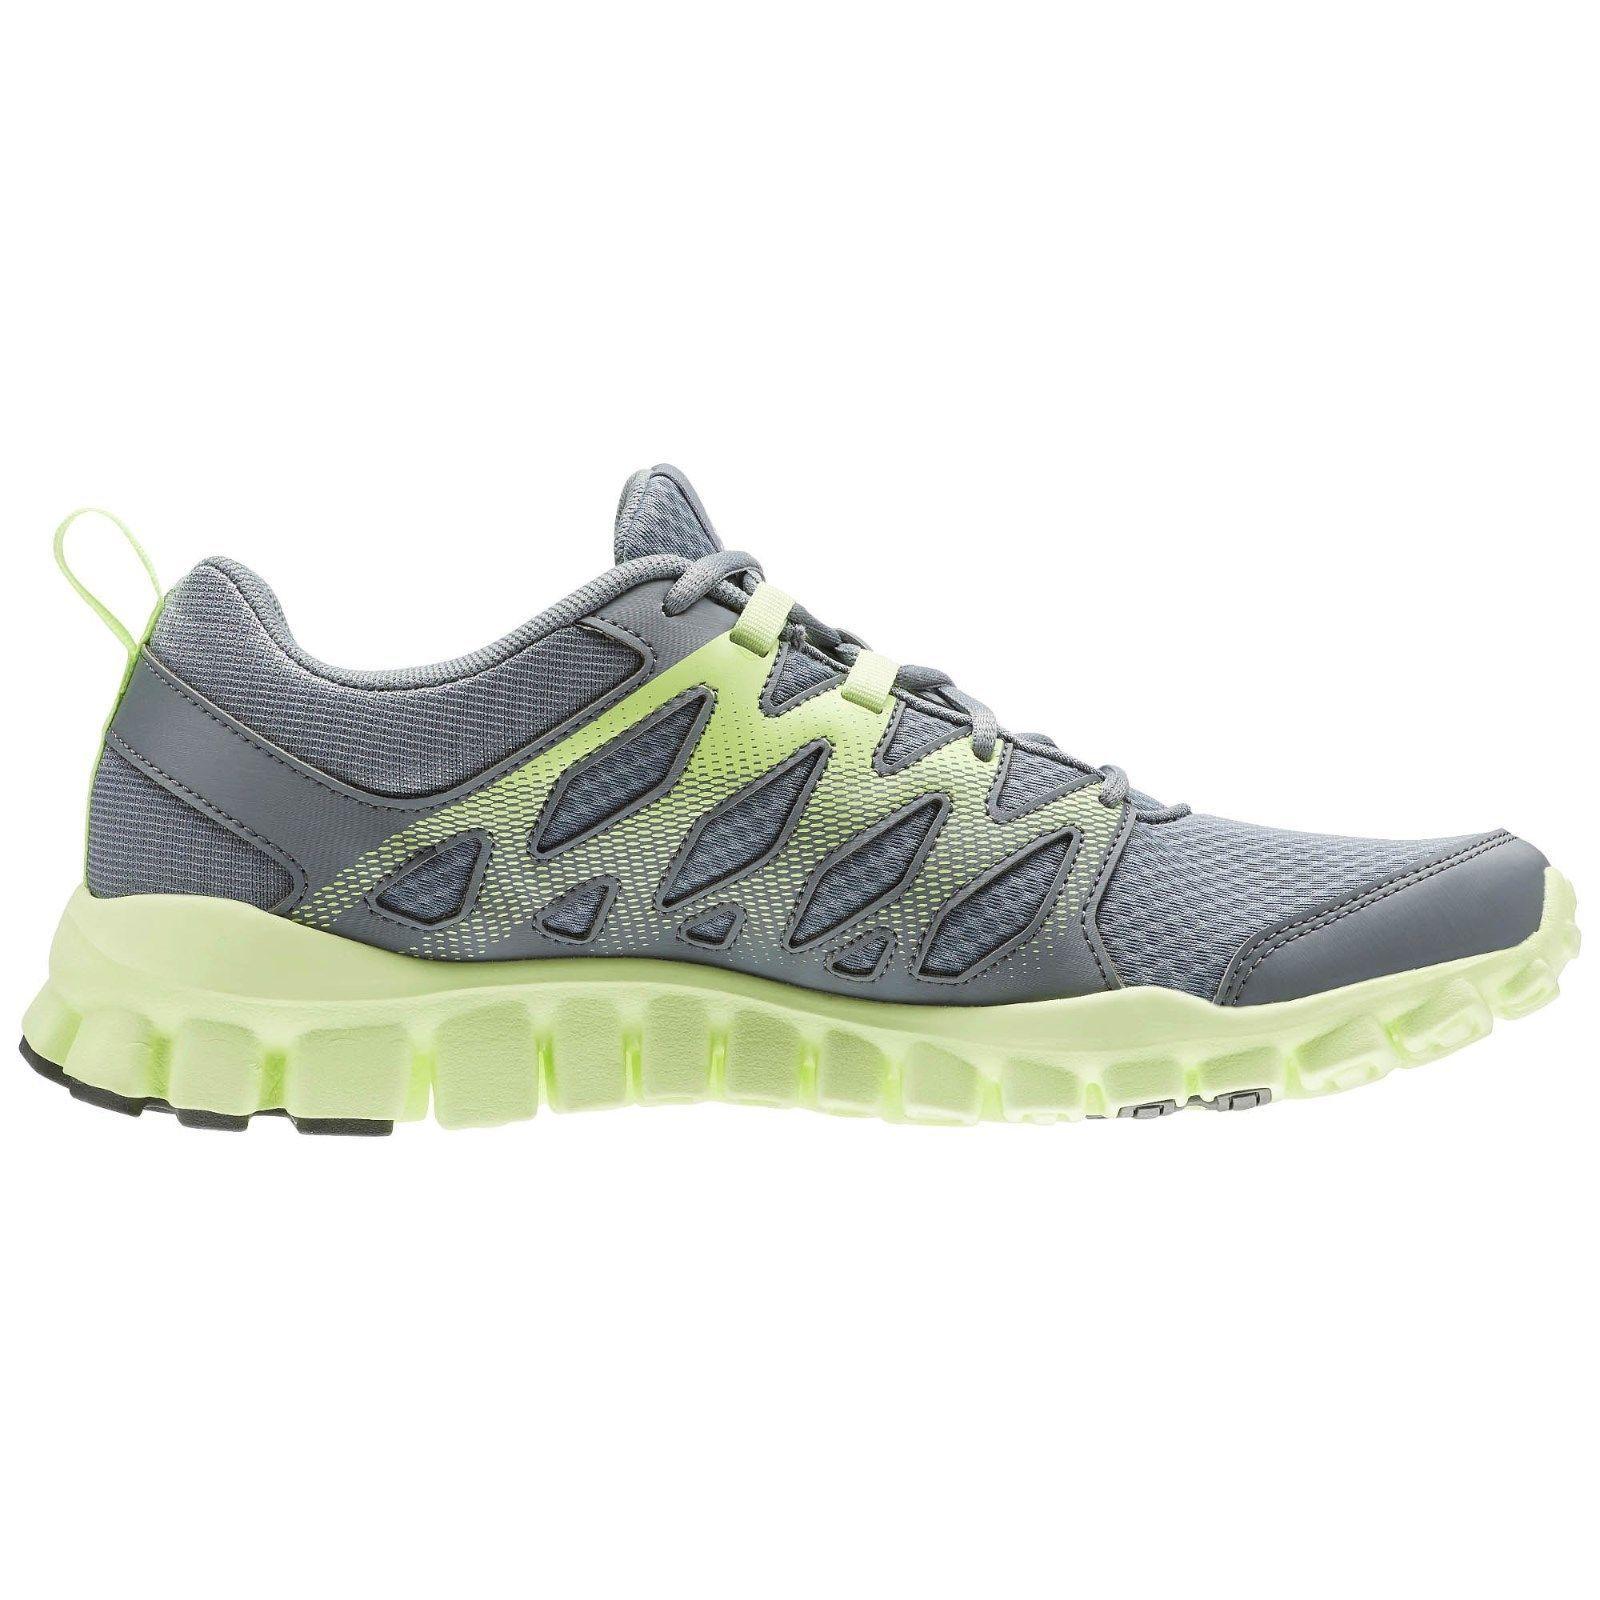 59d44aecf8fddc Reebok Men s RealFlex Train 4.0 shoes Size 7 and 50 similar items